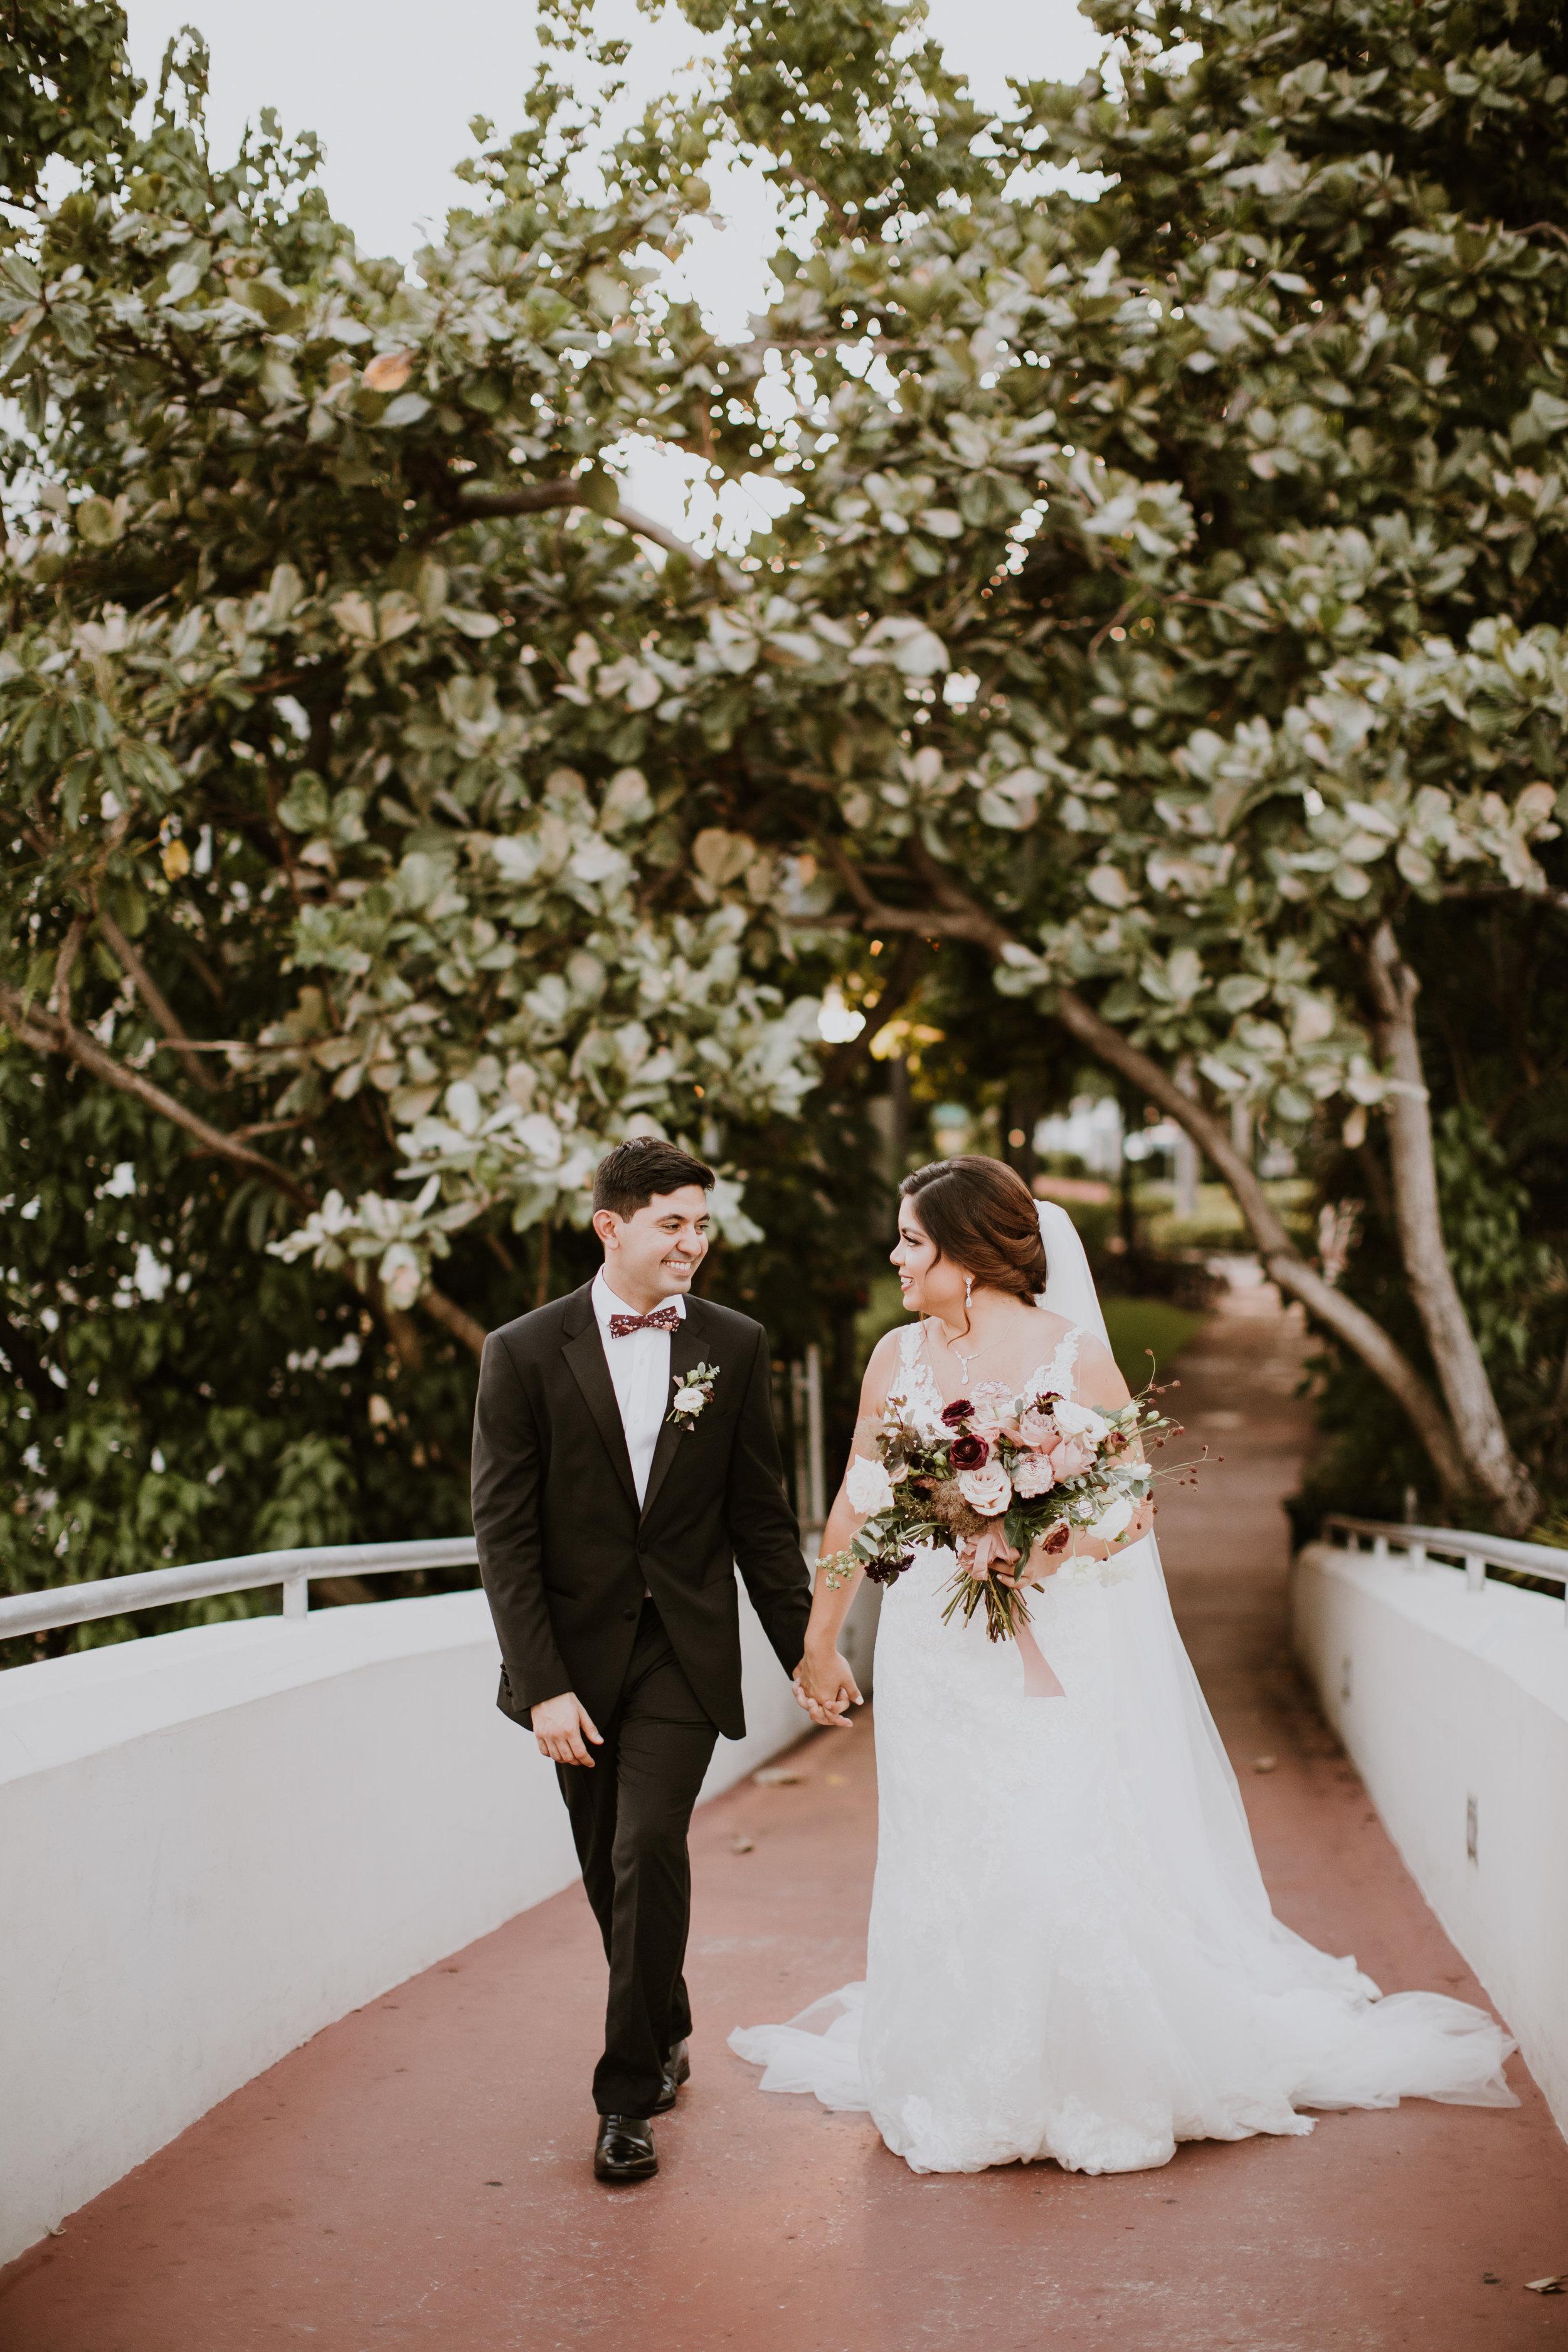 VinandKaren_Married-262.jpg